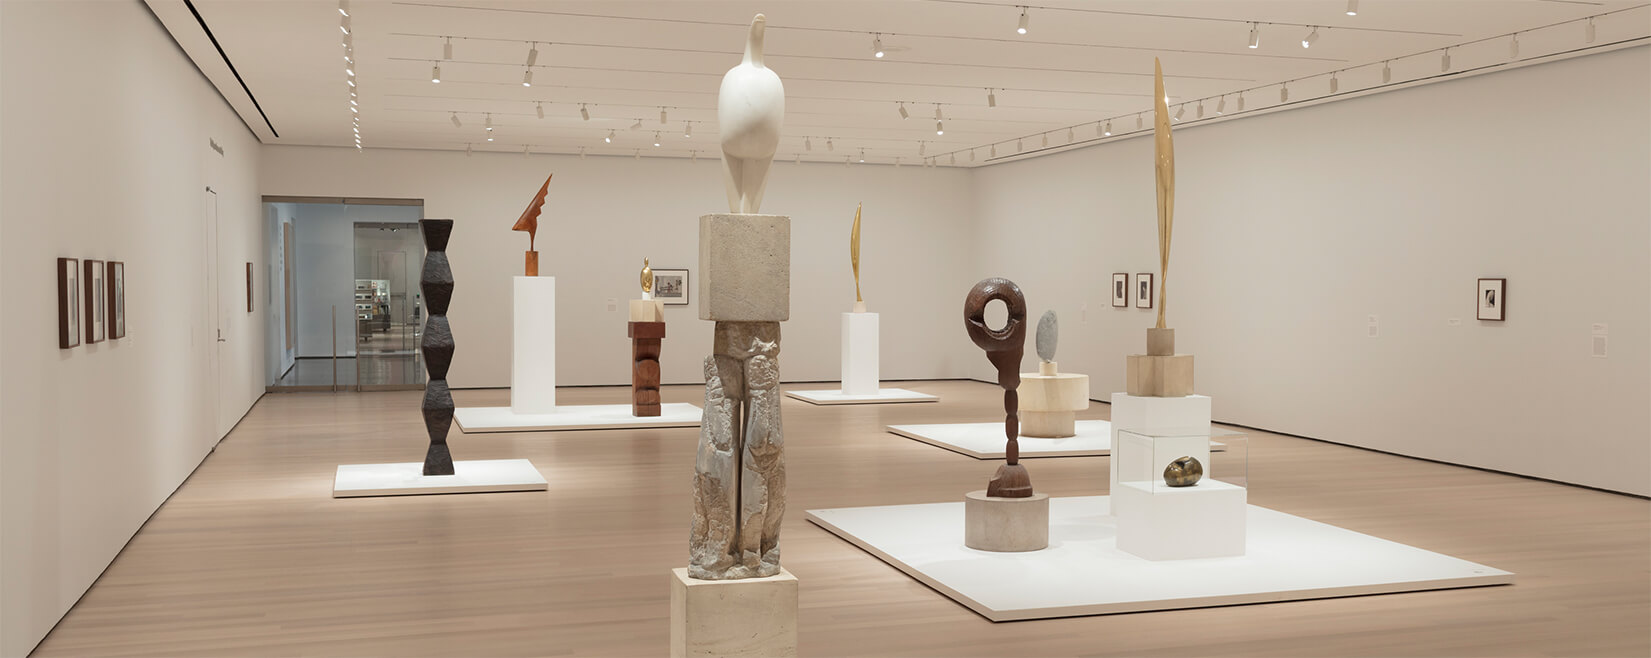 Installation view of Constantin Brancusi Sculpture